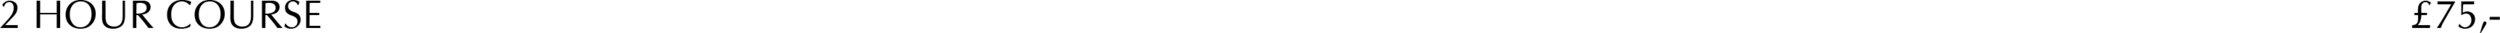 PHIBROWS MICROBLADING BLACK FONT 8.jpg